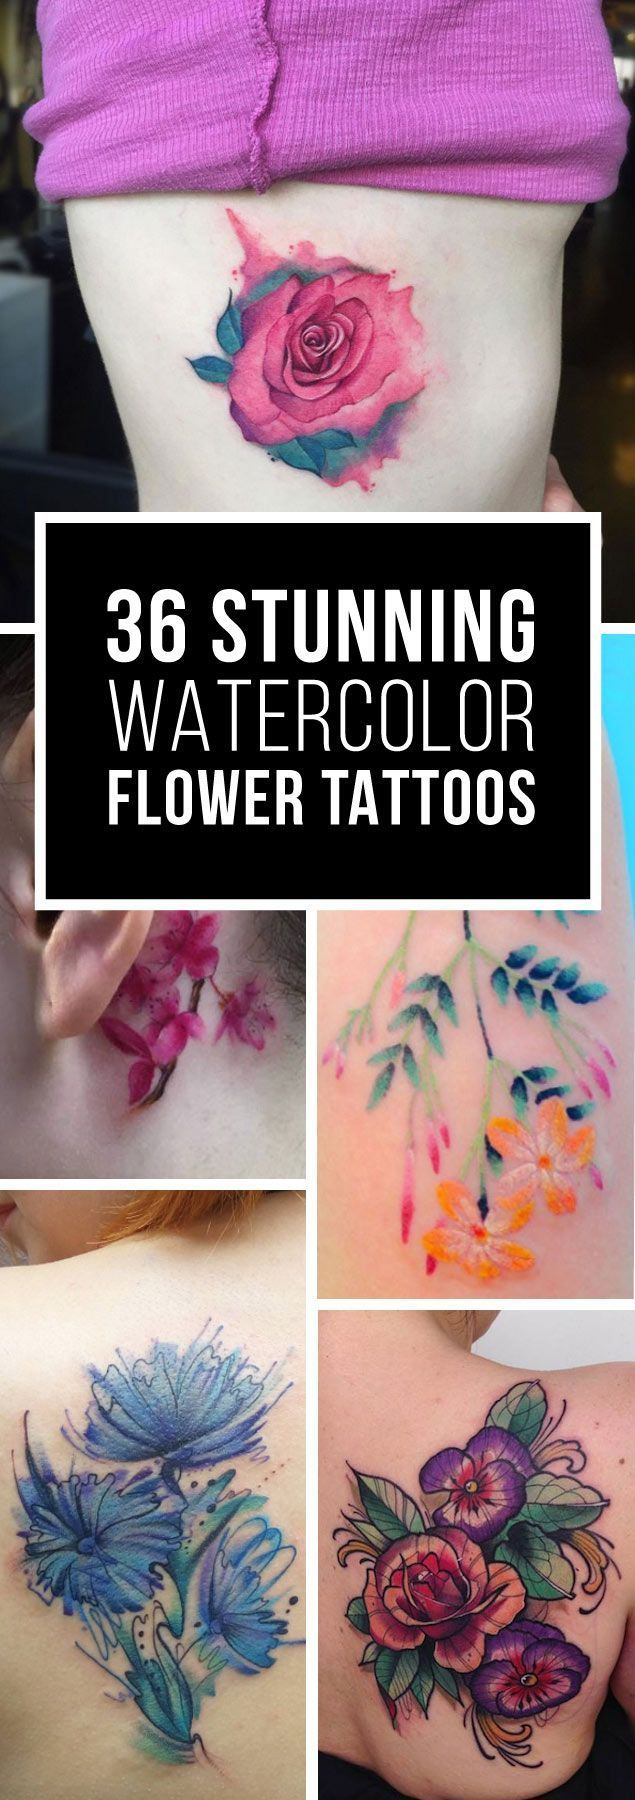 Pin by kate pachner on tattoos pinterest tattoo tatoo and tatoos